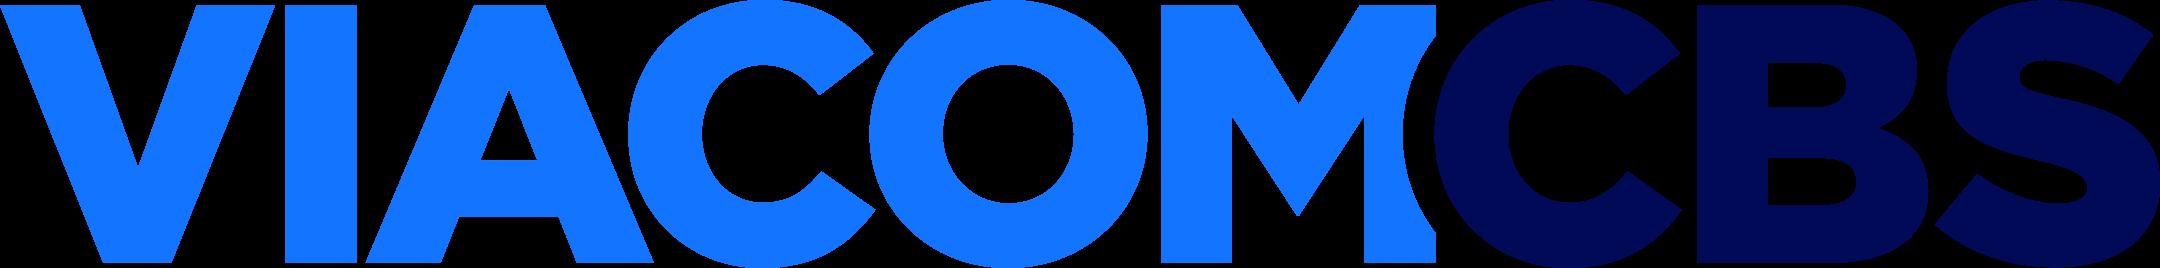 viacomcbs logo 1 - ViacomCBS Logo